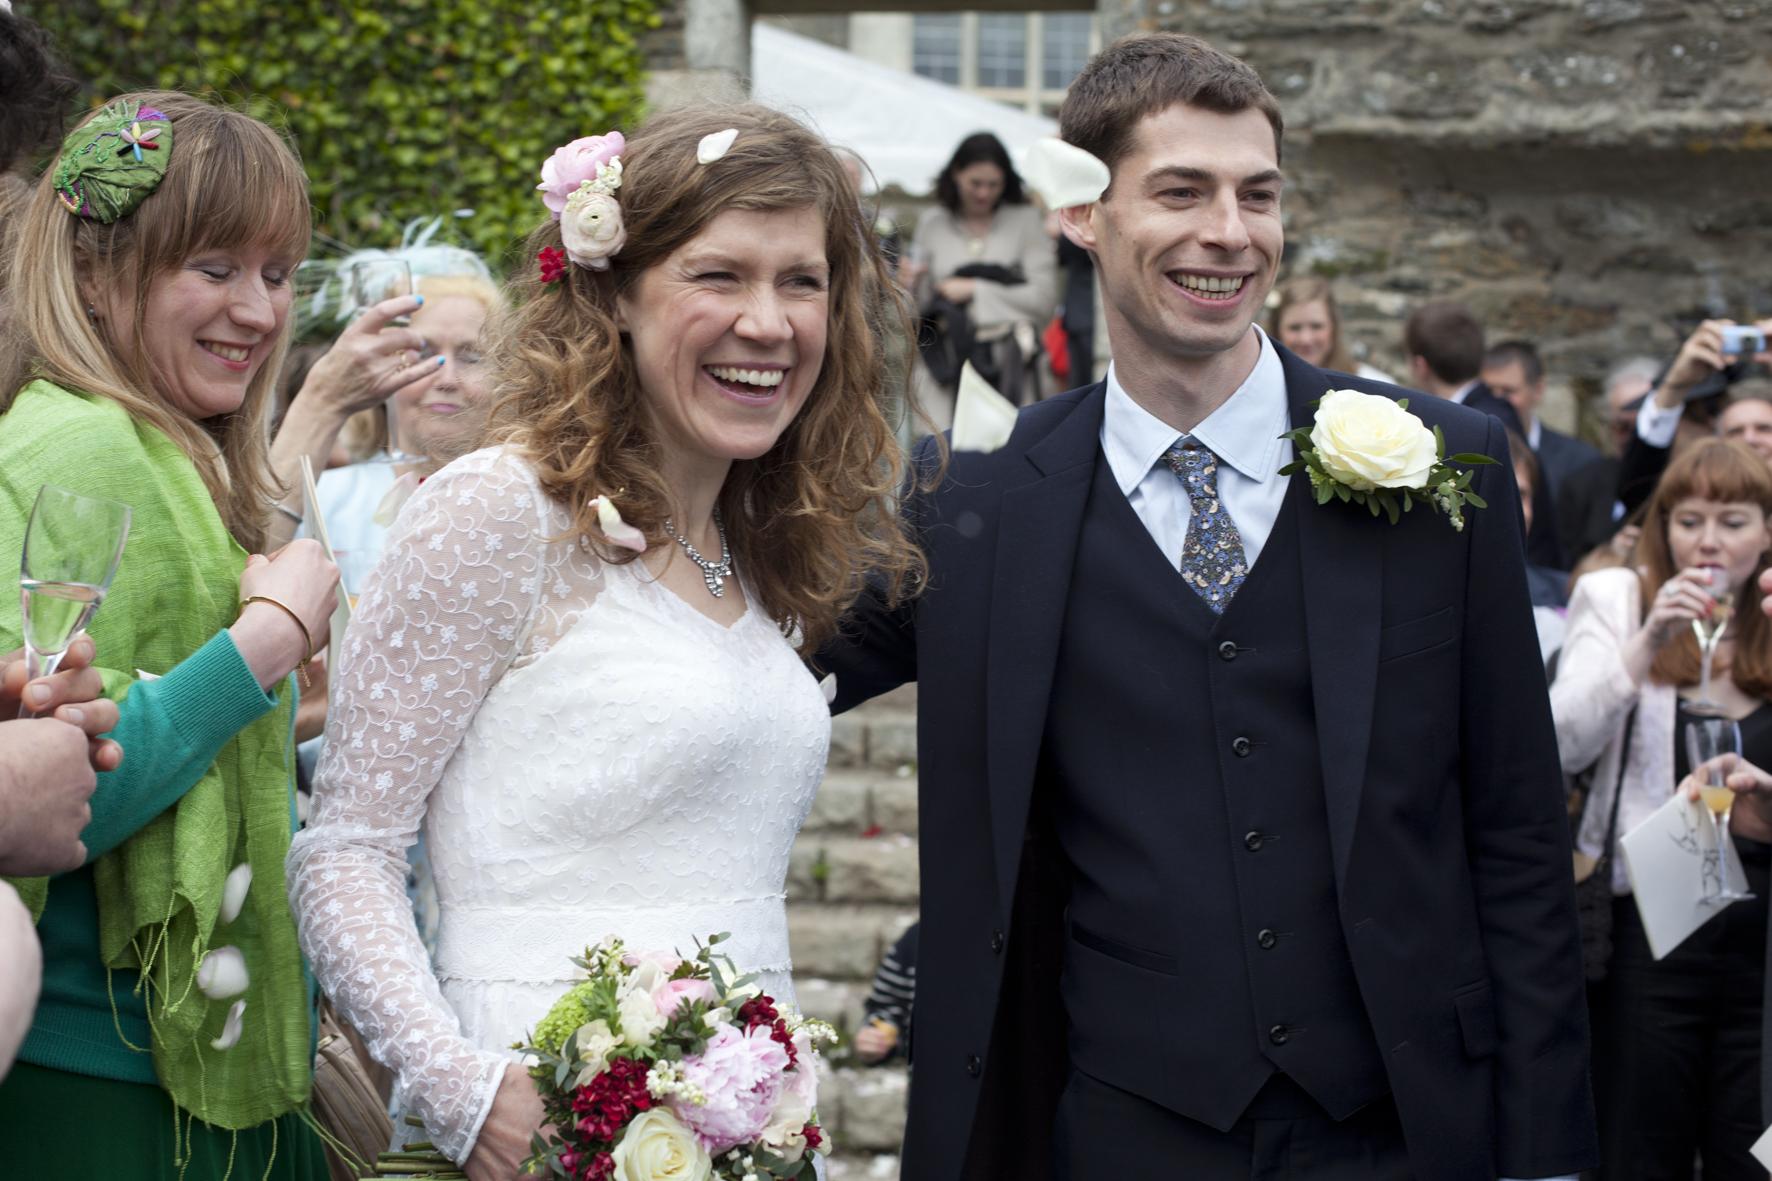 Wedding example_M&P__MG_3645_Claudia Leisinger.jpg